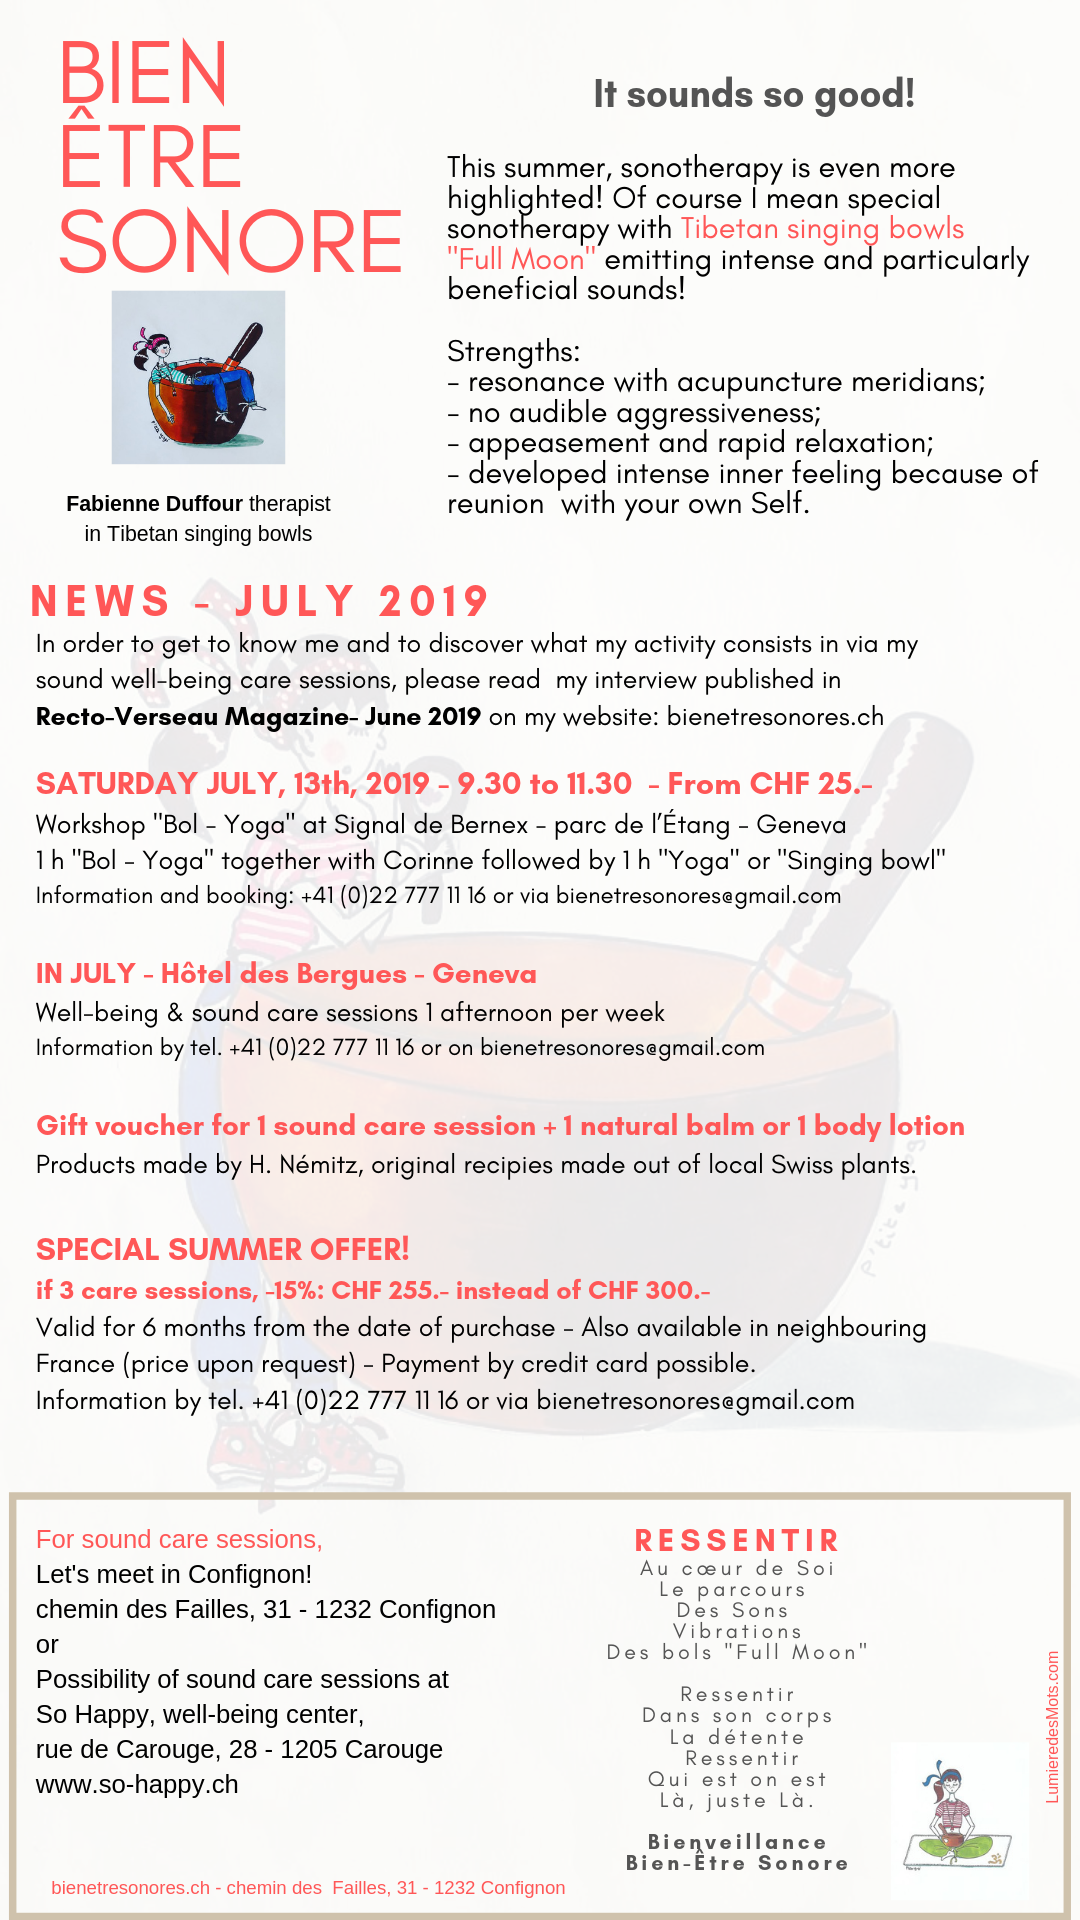 Newsletter Bien Être Sonore July 2019